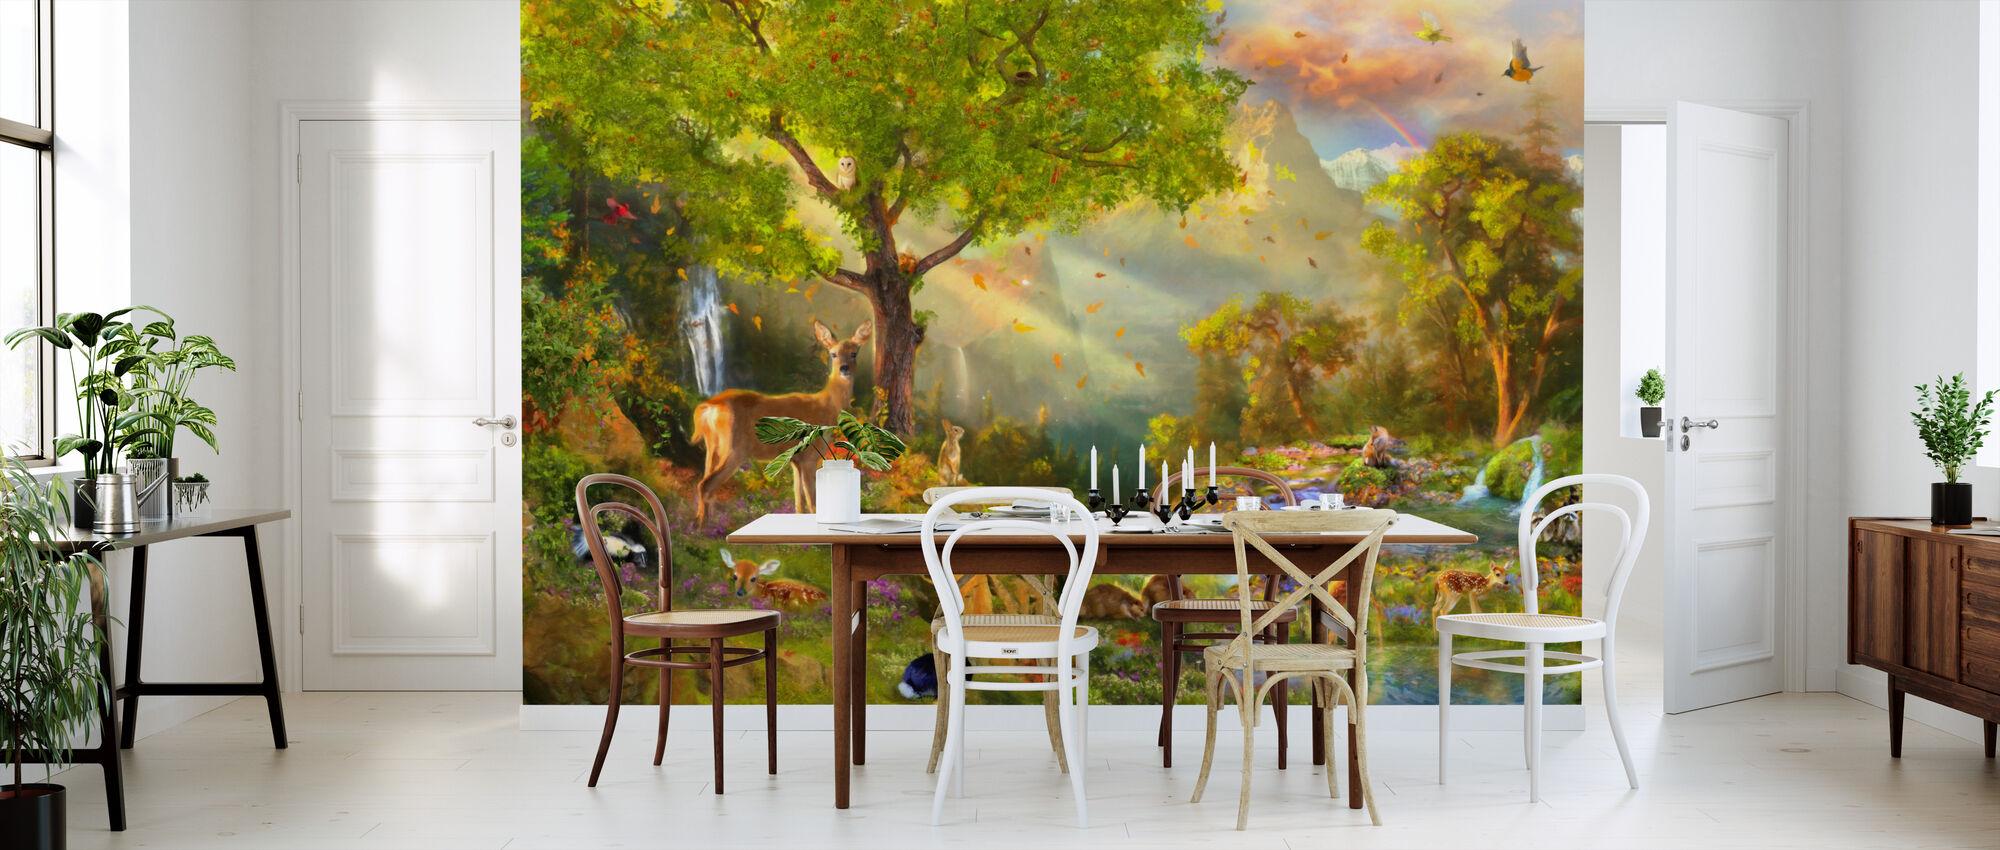 Fawn Mountain - Wallpaper - Kitchen